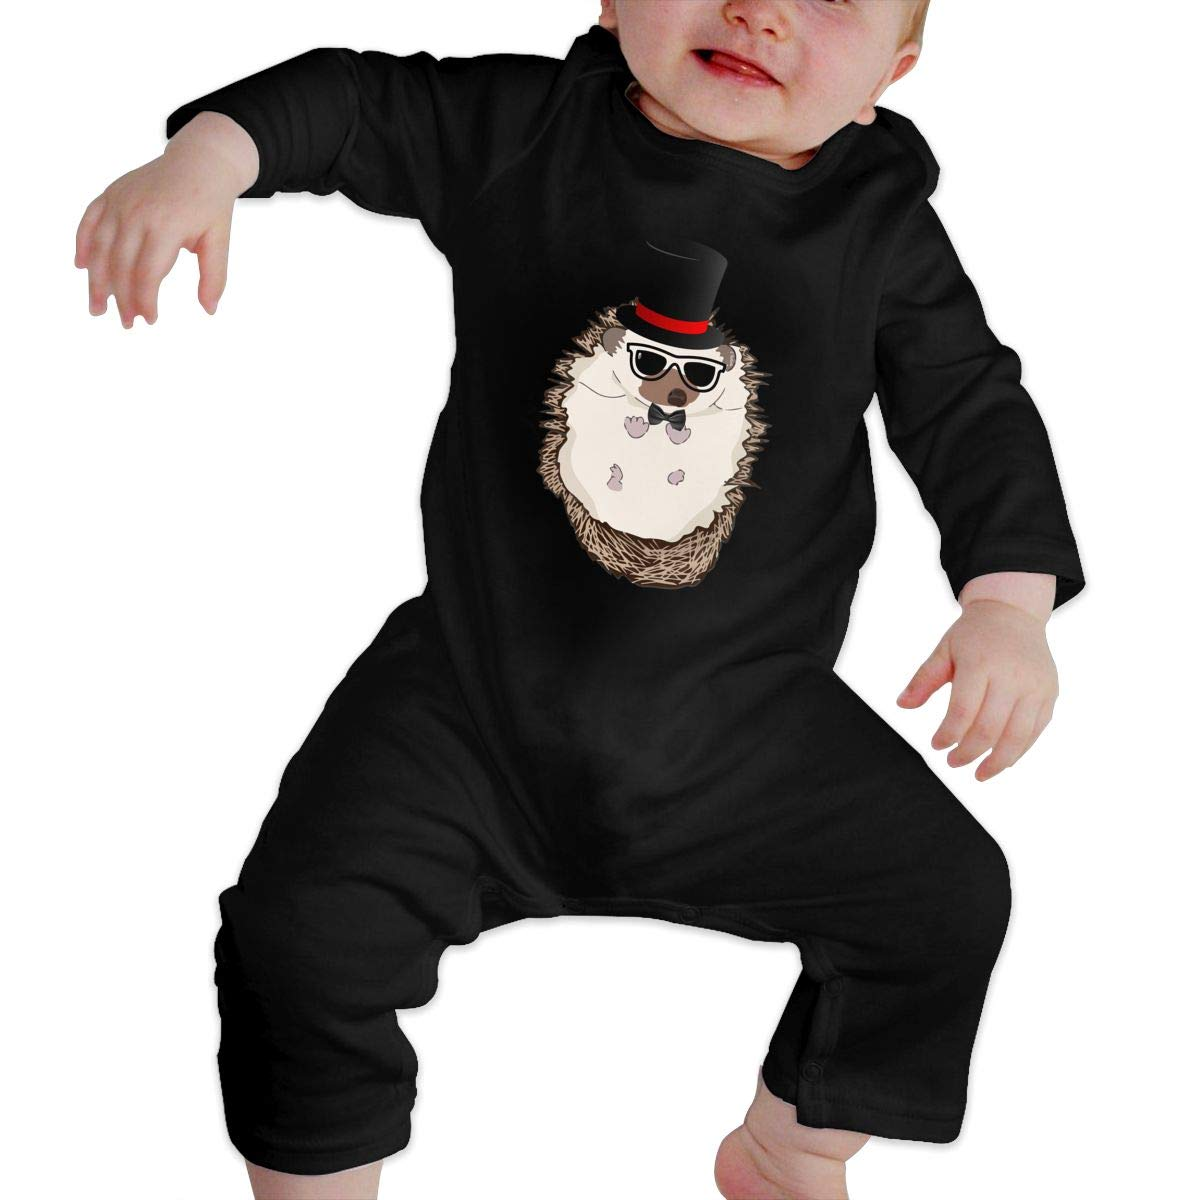 TREEWw Top Hat Hipster Hedgehog Unisex Baby Romper One Piece Jumpsuit 100/% Cotton Union Suit